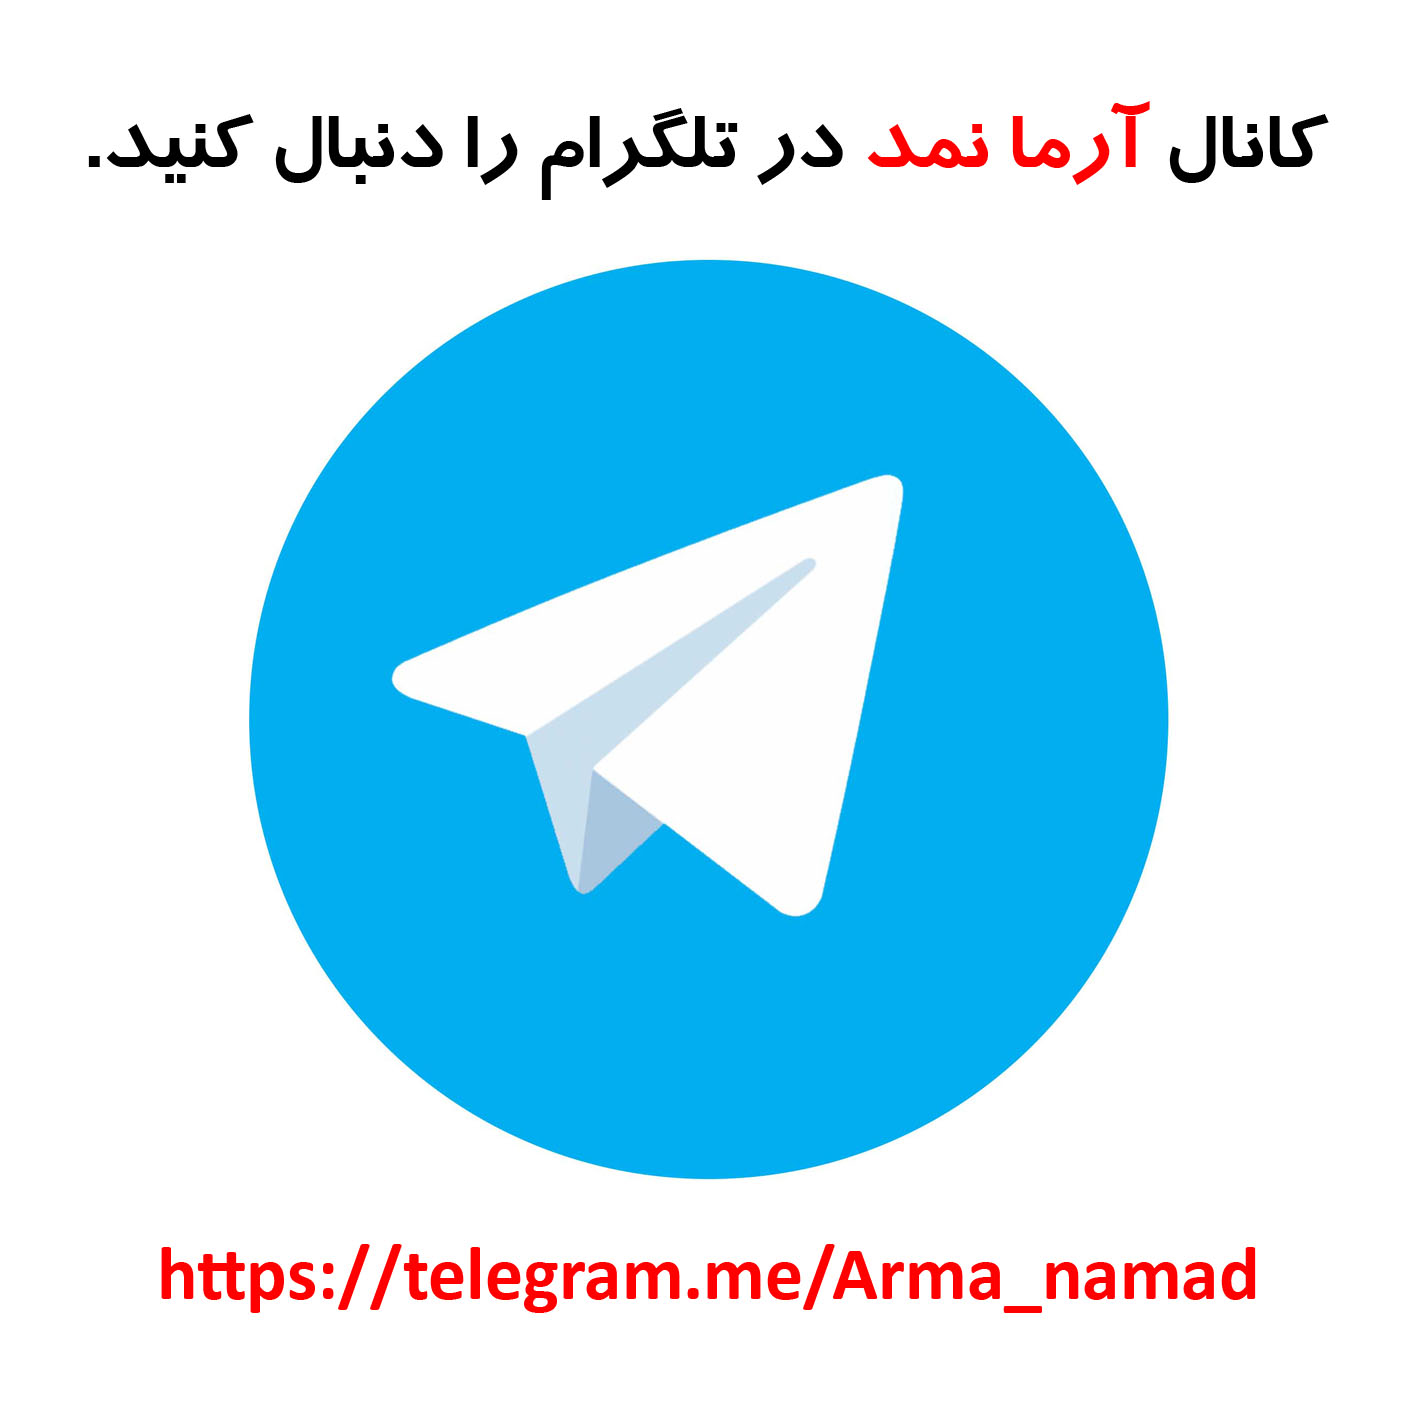 کانال+تلگرام+خرید+لباس+مردانه